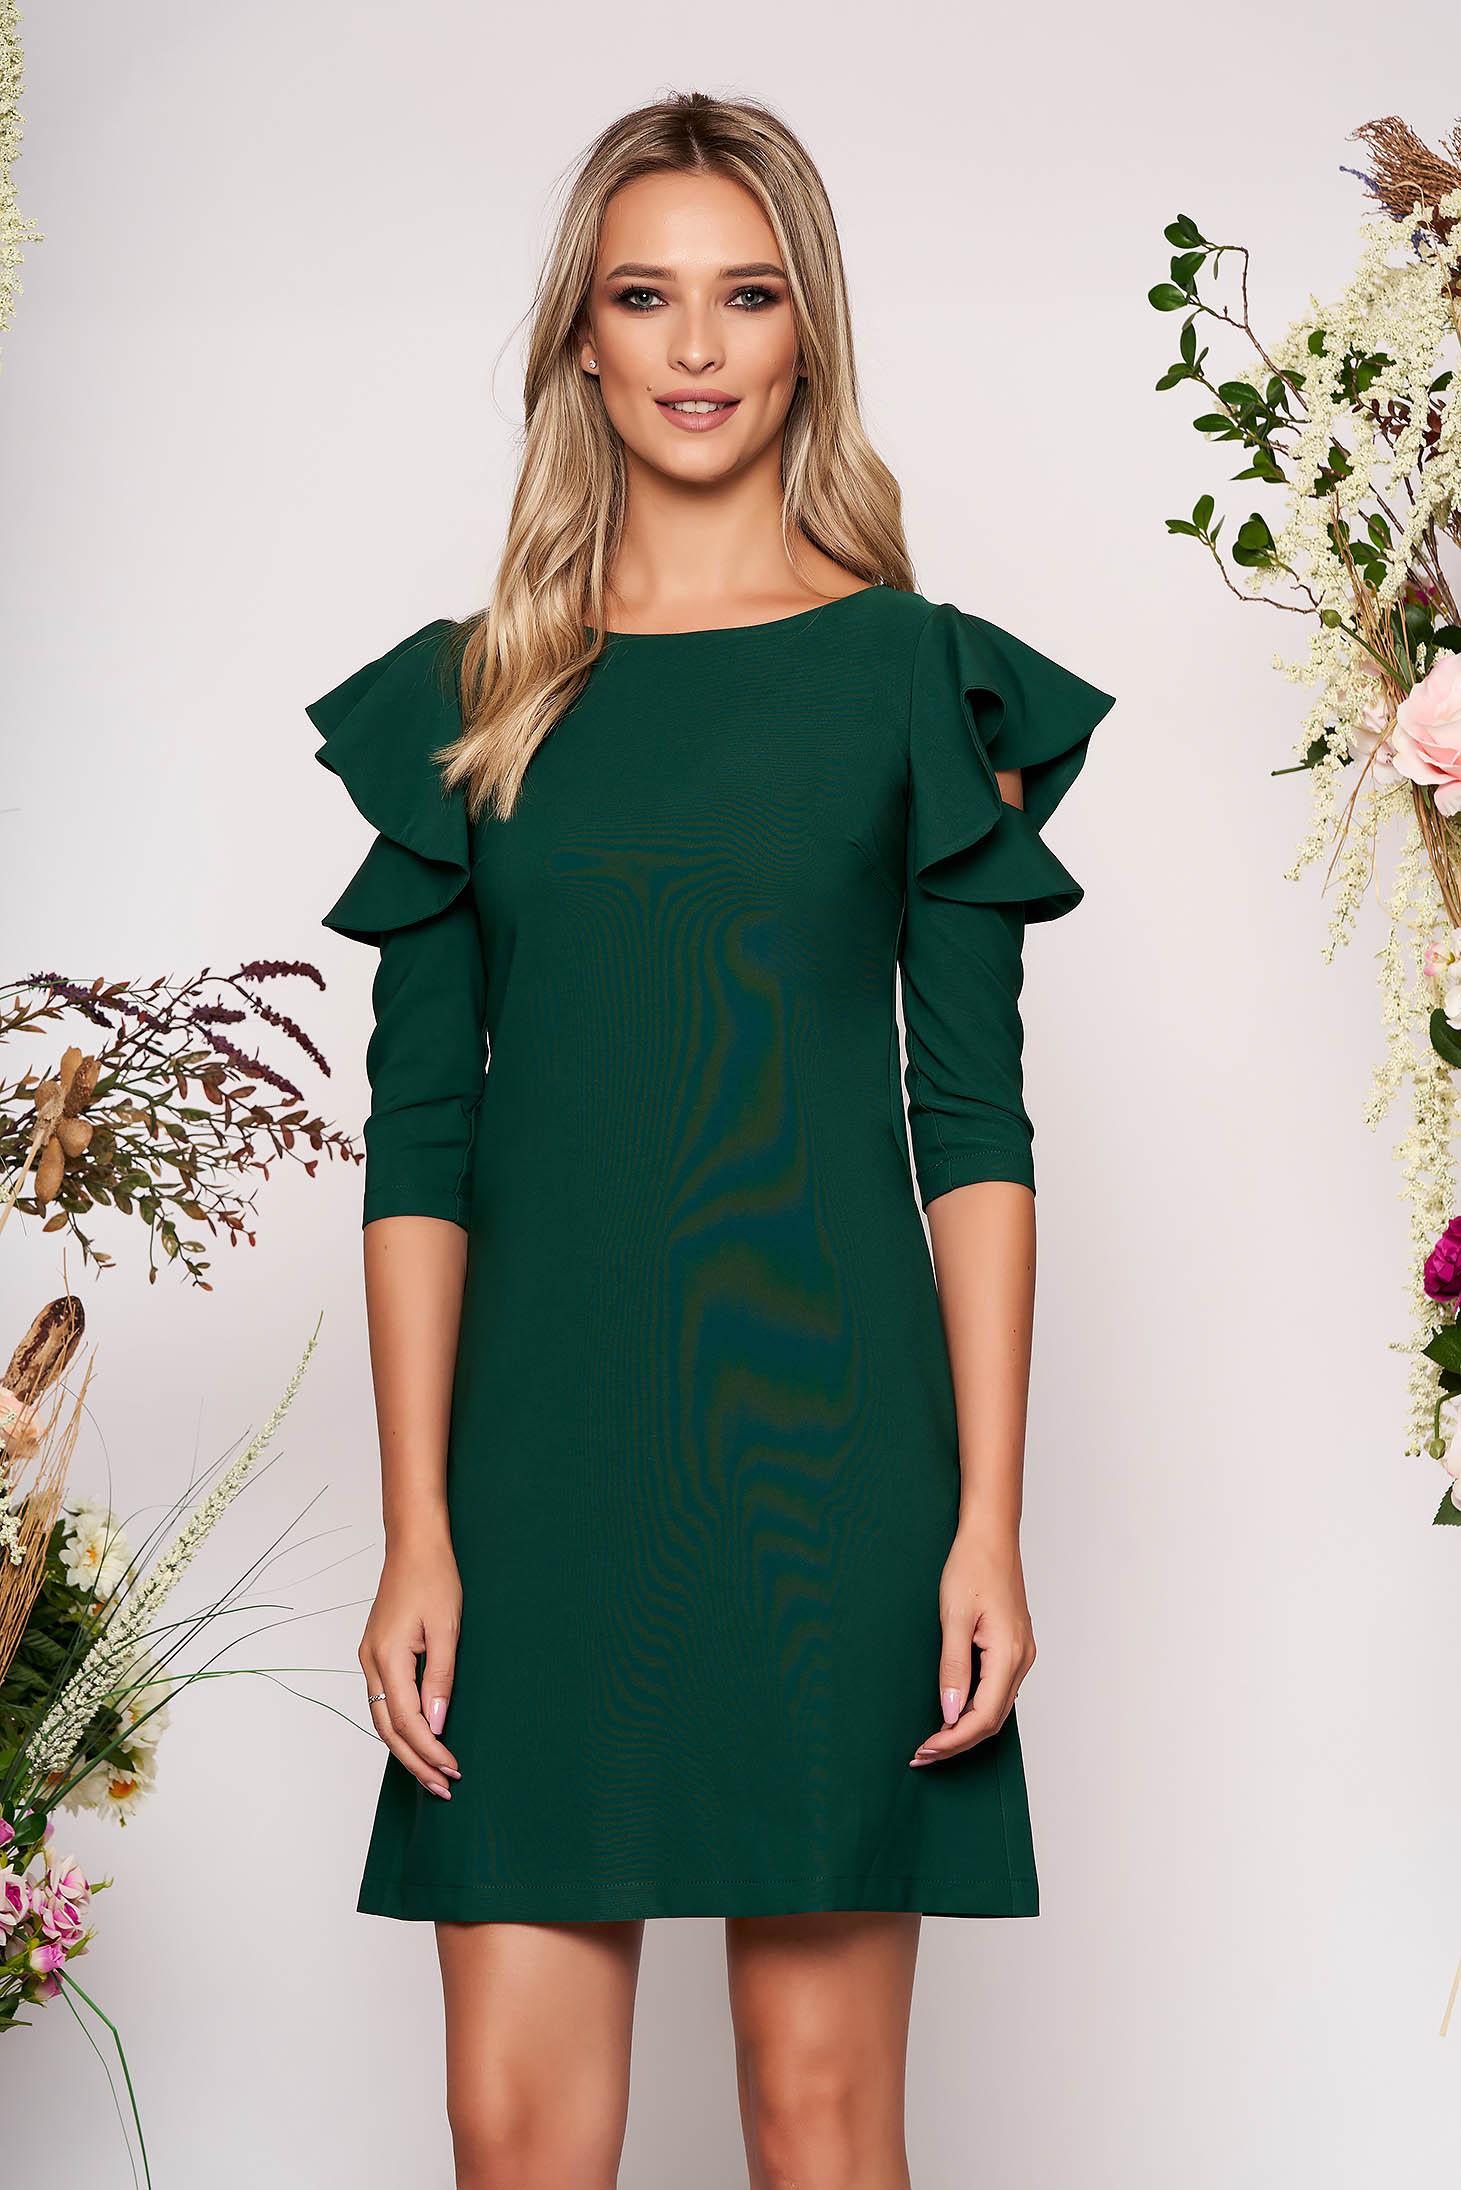 Darkgreen daily elegant a-line dress slightly elastic fabric with ruffled sleeves